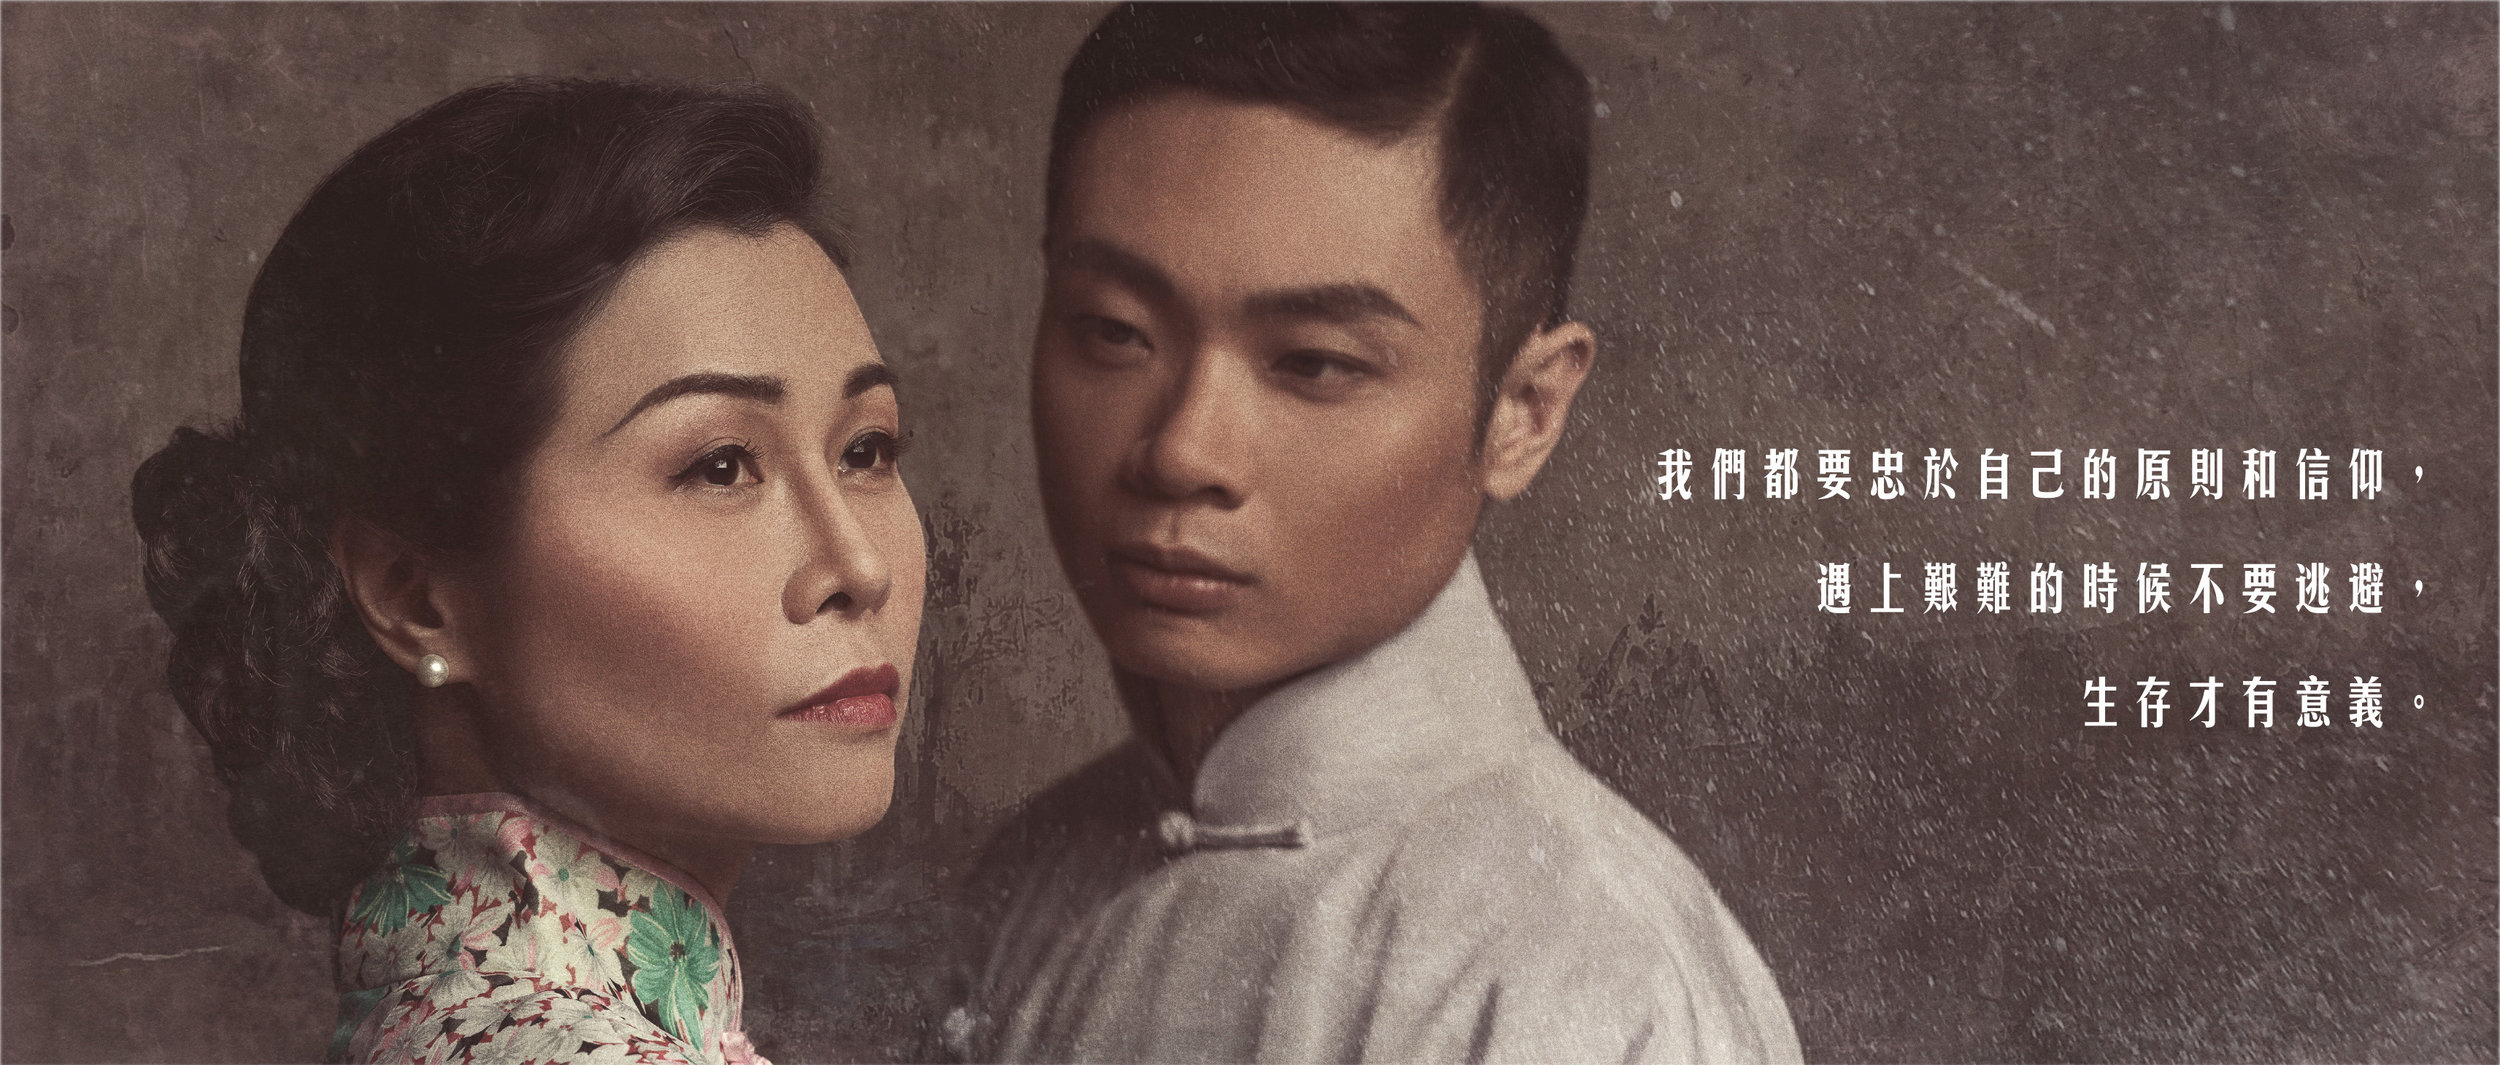 HKREP 我們的故事 (In Times of Turmoil) Poster. Hong Kong. 2017